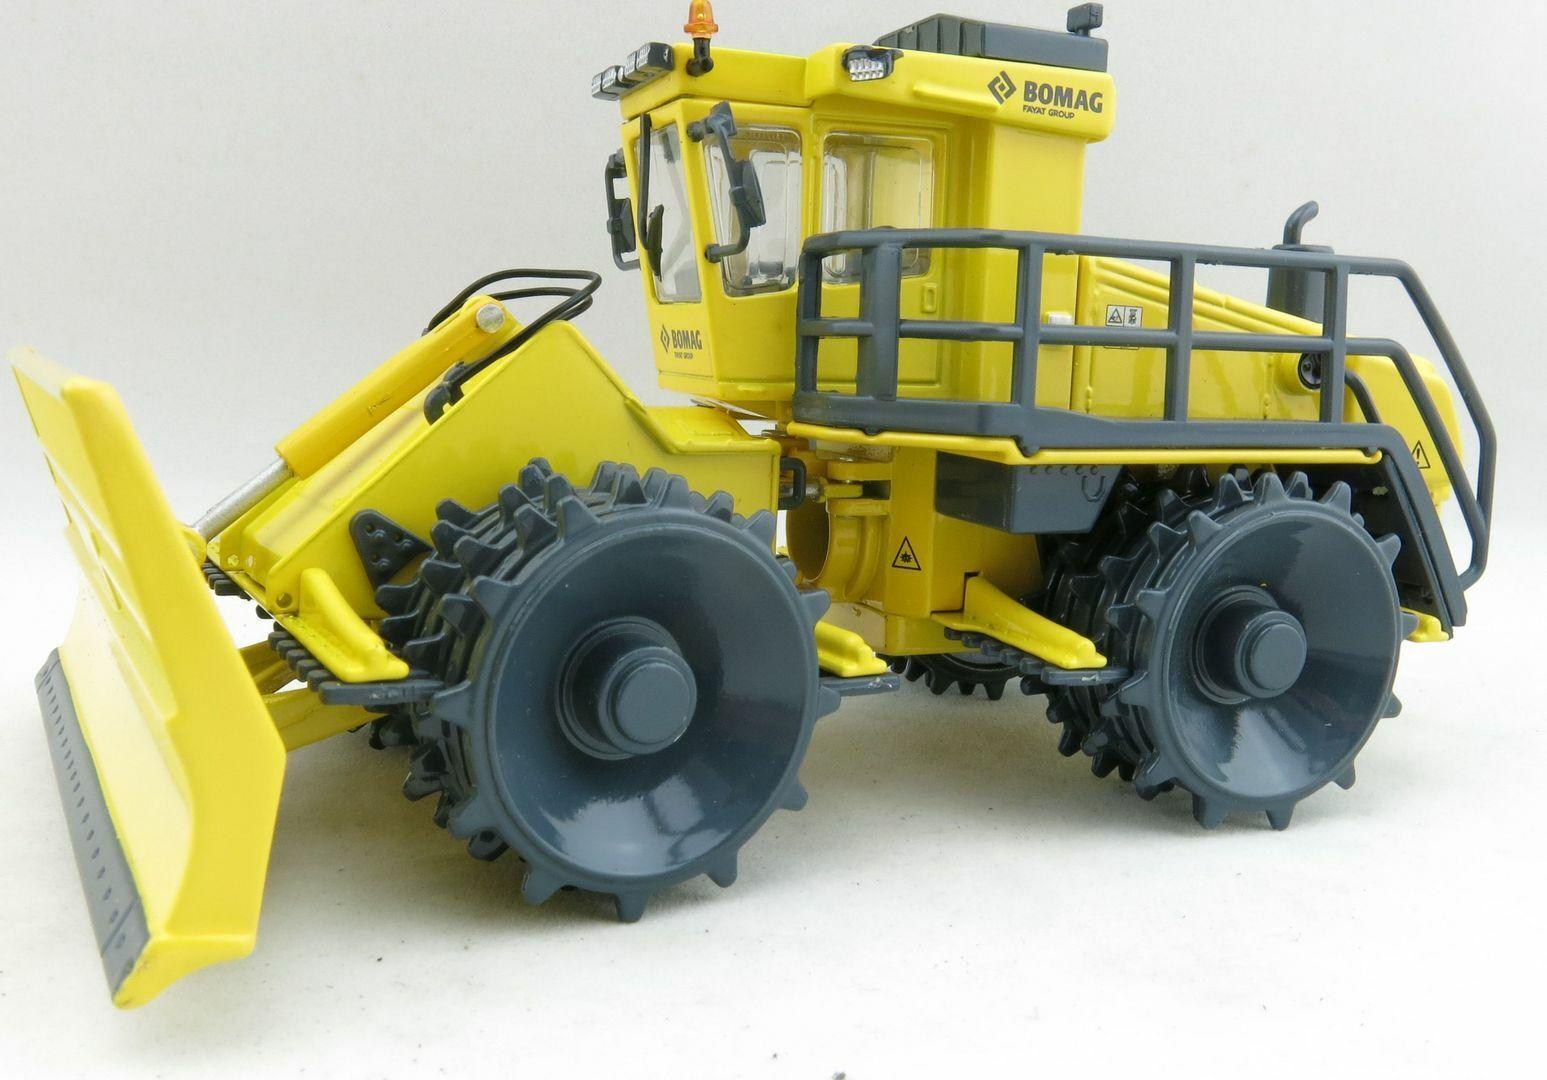 Kaster Scale Models WM9736 Bomag BC 1172  RB REFUSE COMPACTOR Wheel Loader 1 50  liquidation de la boutique